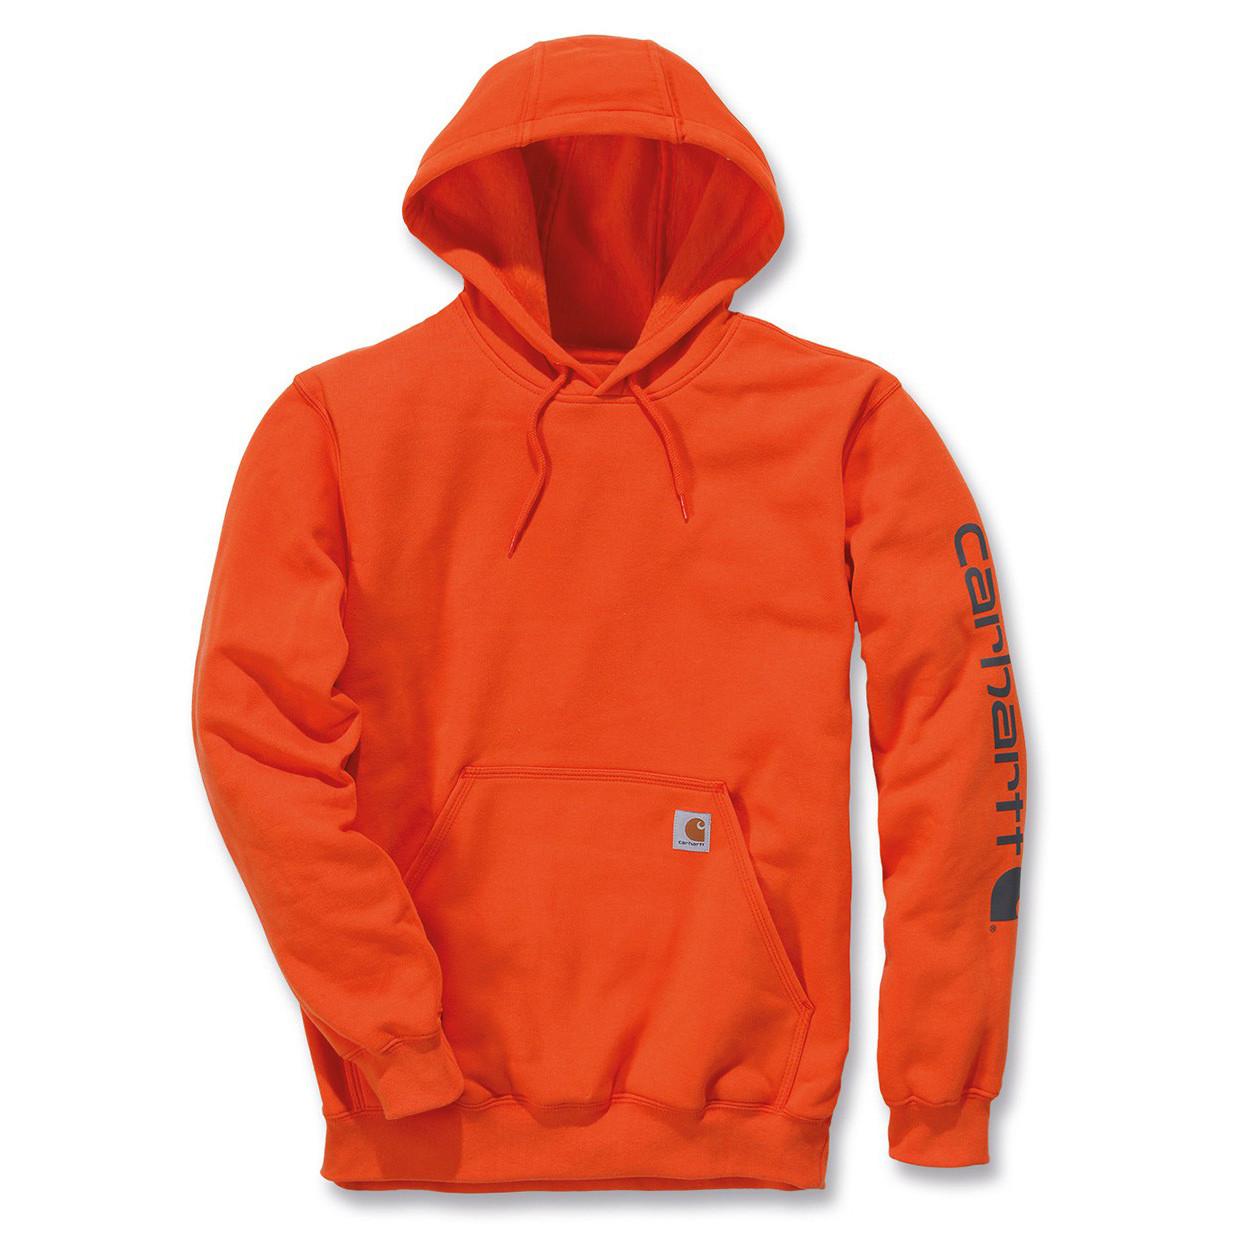 Худи Carhartt Sleeve Logo Hooded Sweatshirt - K288 (Orange, L)